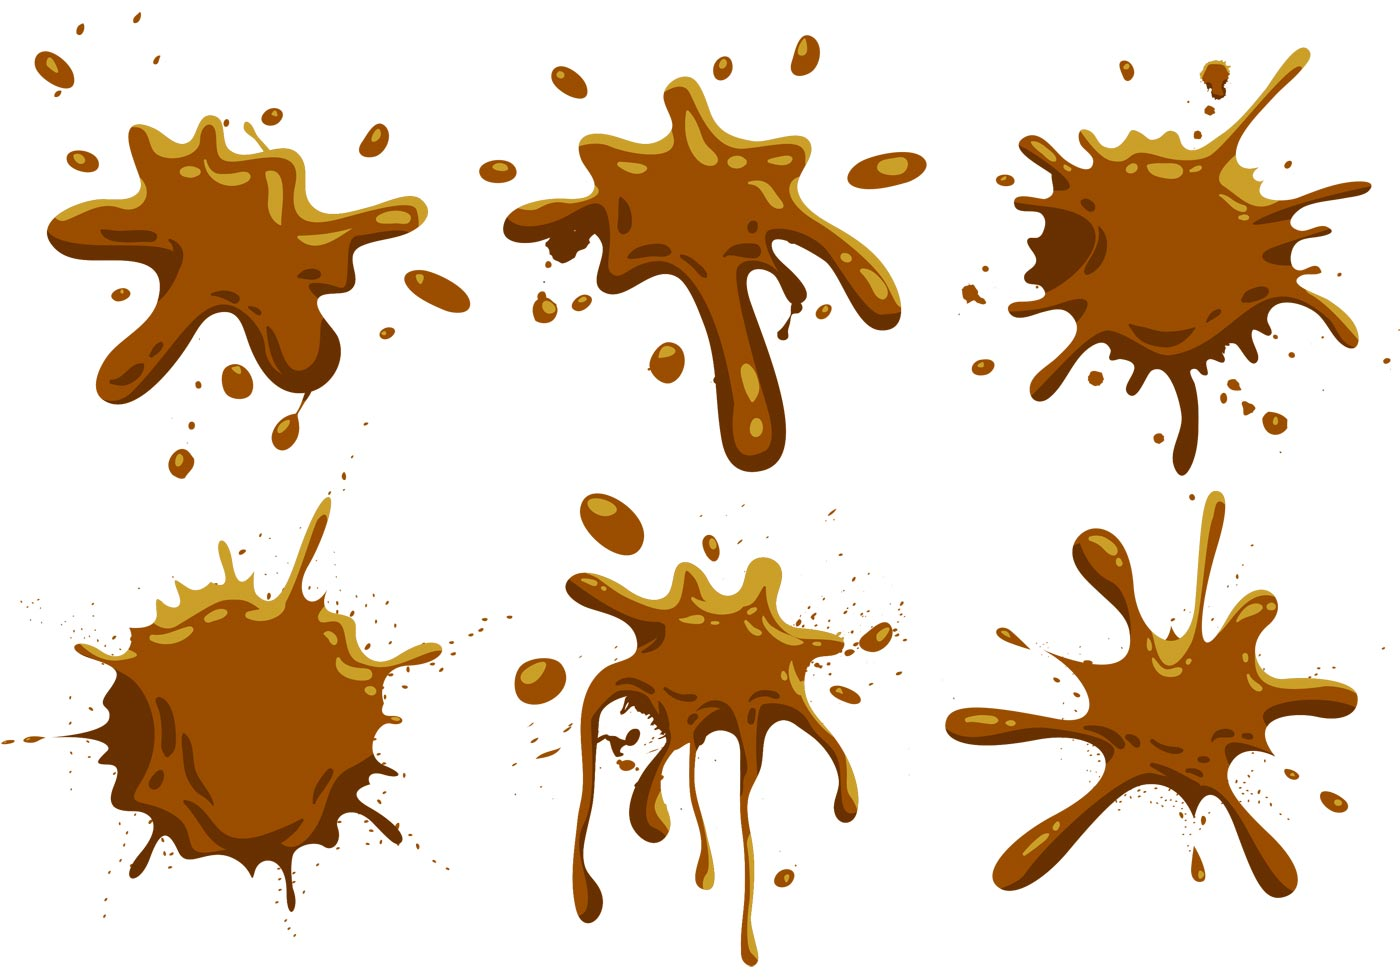 mud splatter free vector art  1264 free downloads splatter clipart black and white paint splatter clipart